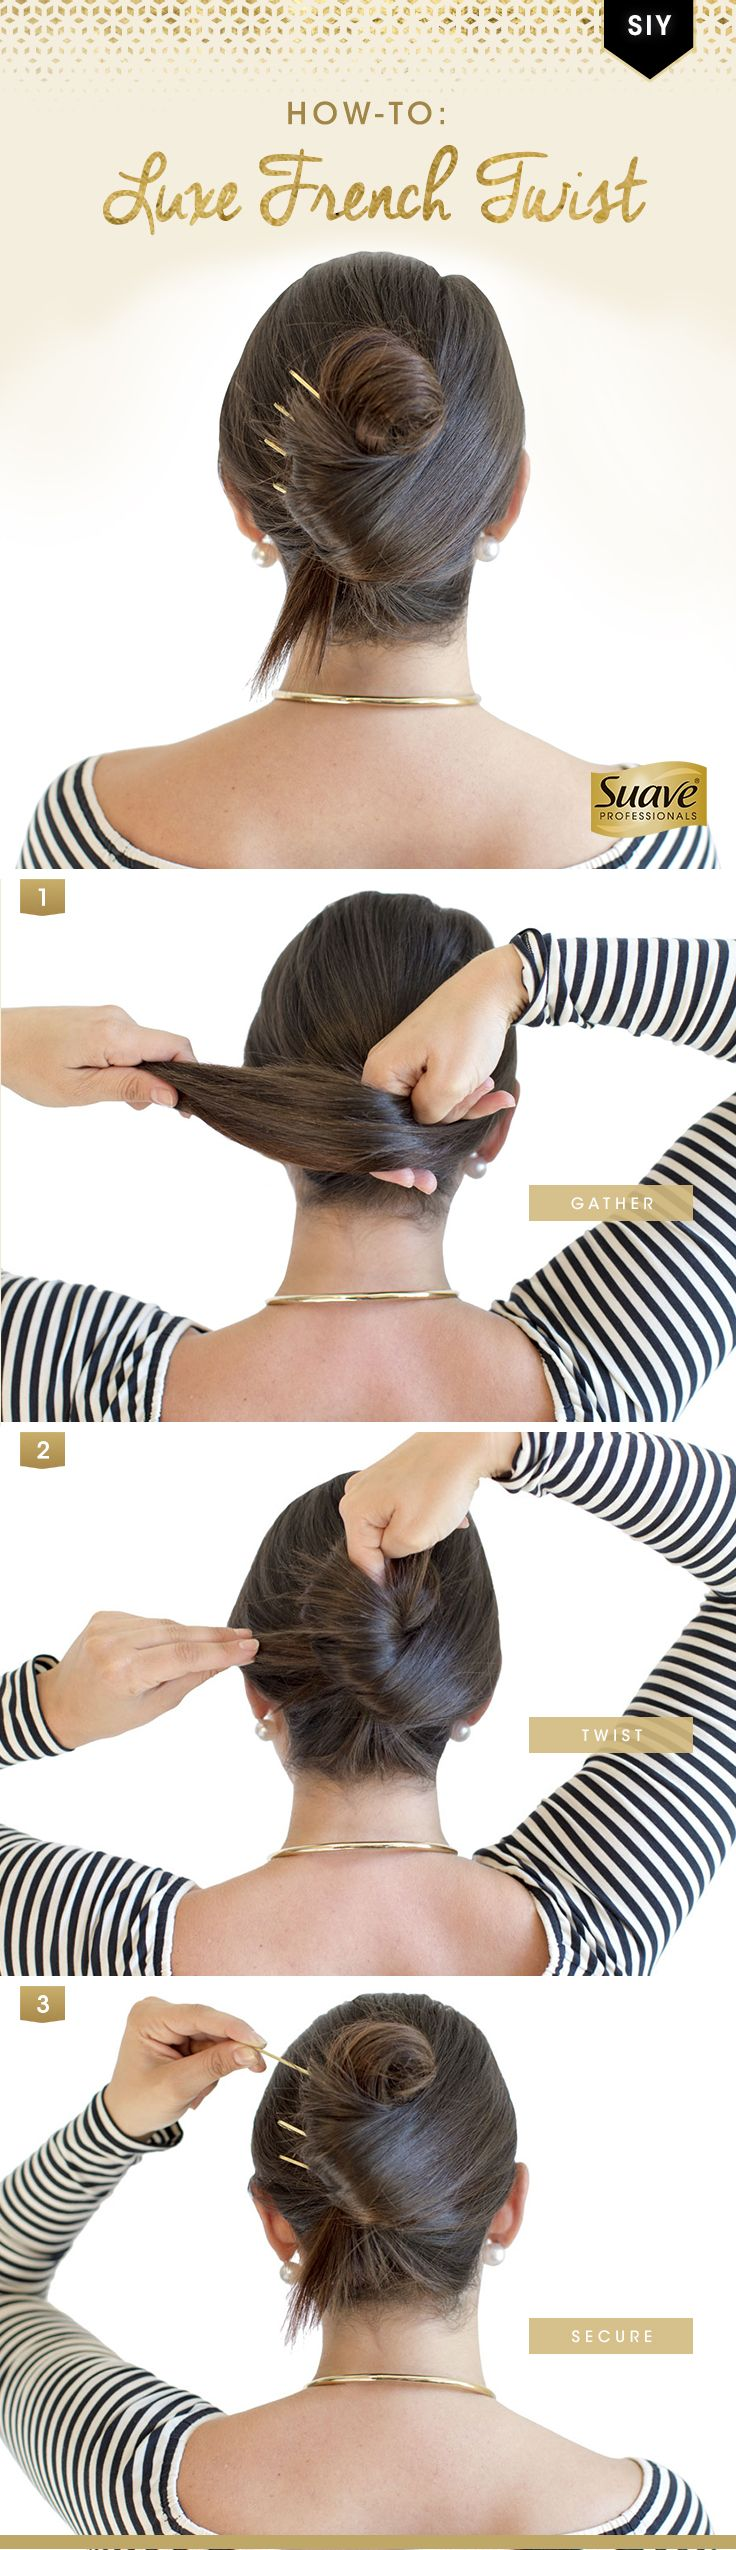 best hairubeauty images on pinterest